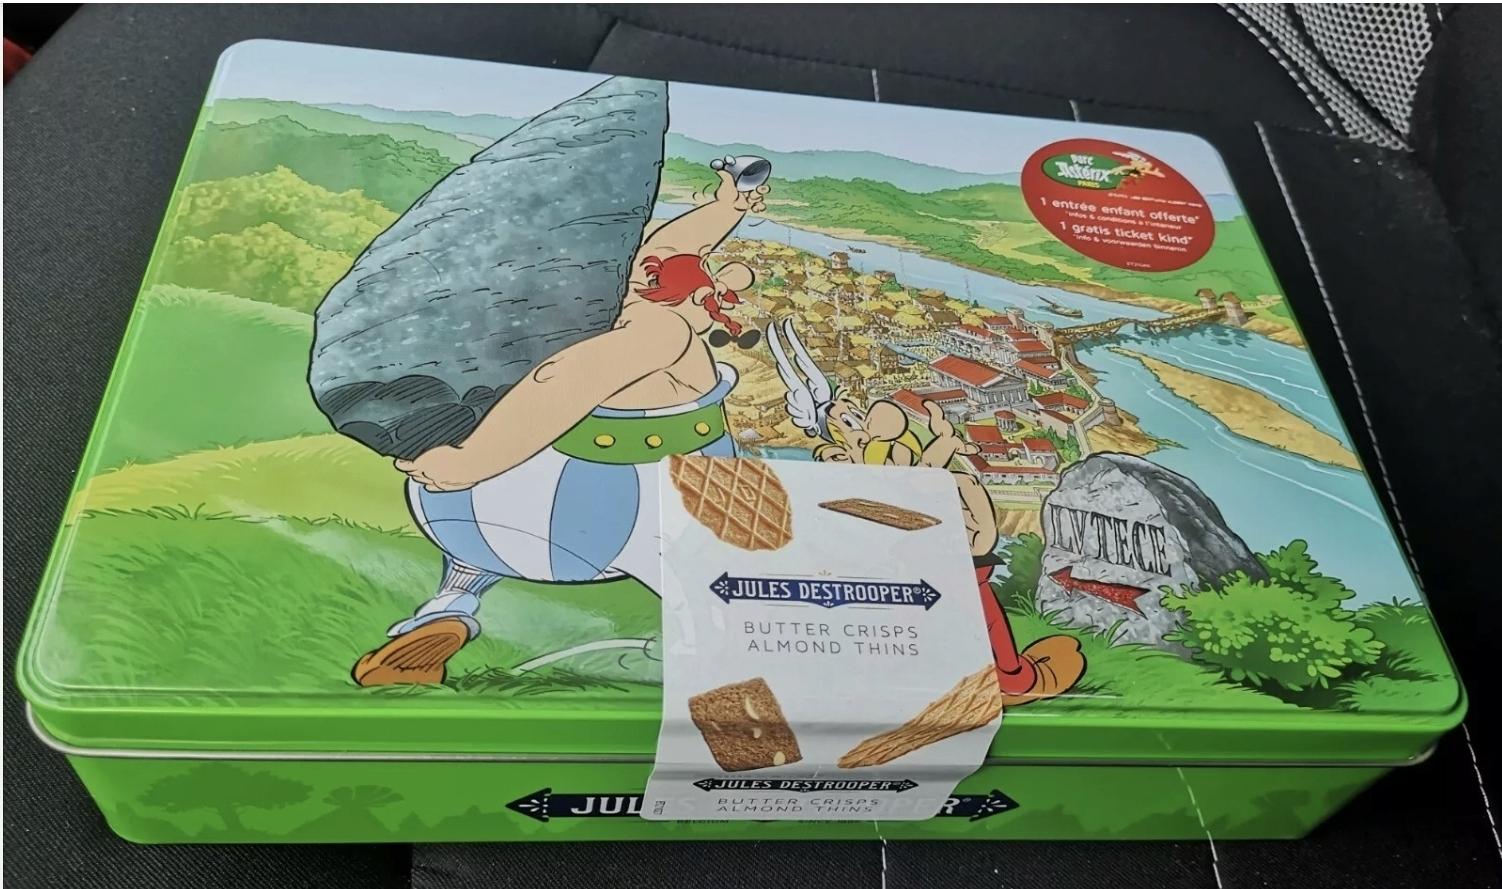 Coffret Astérix et Obelix pour les biscuits JULES DESTROOPER Screen48